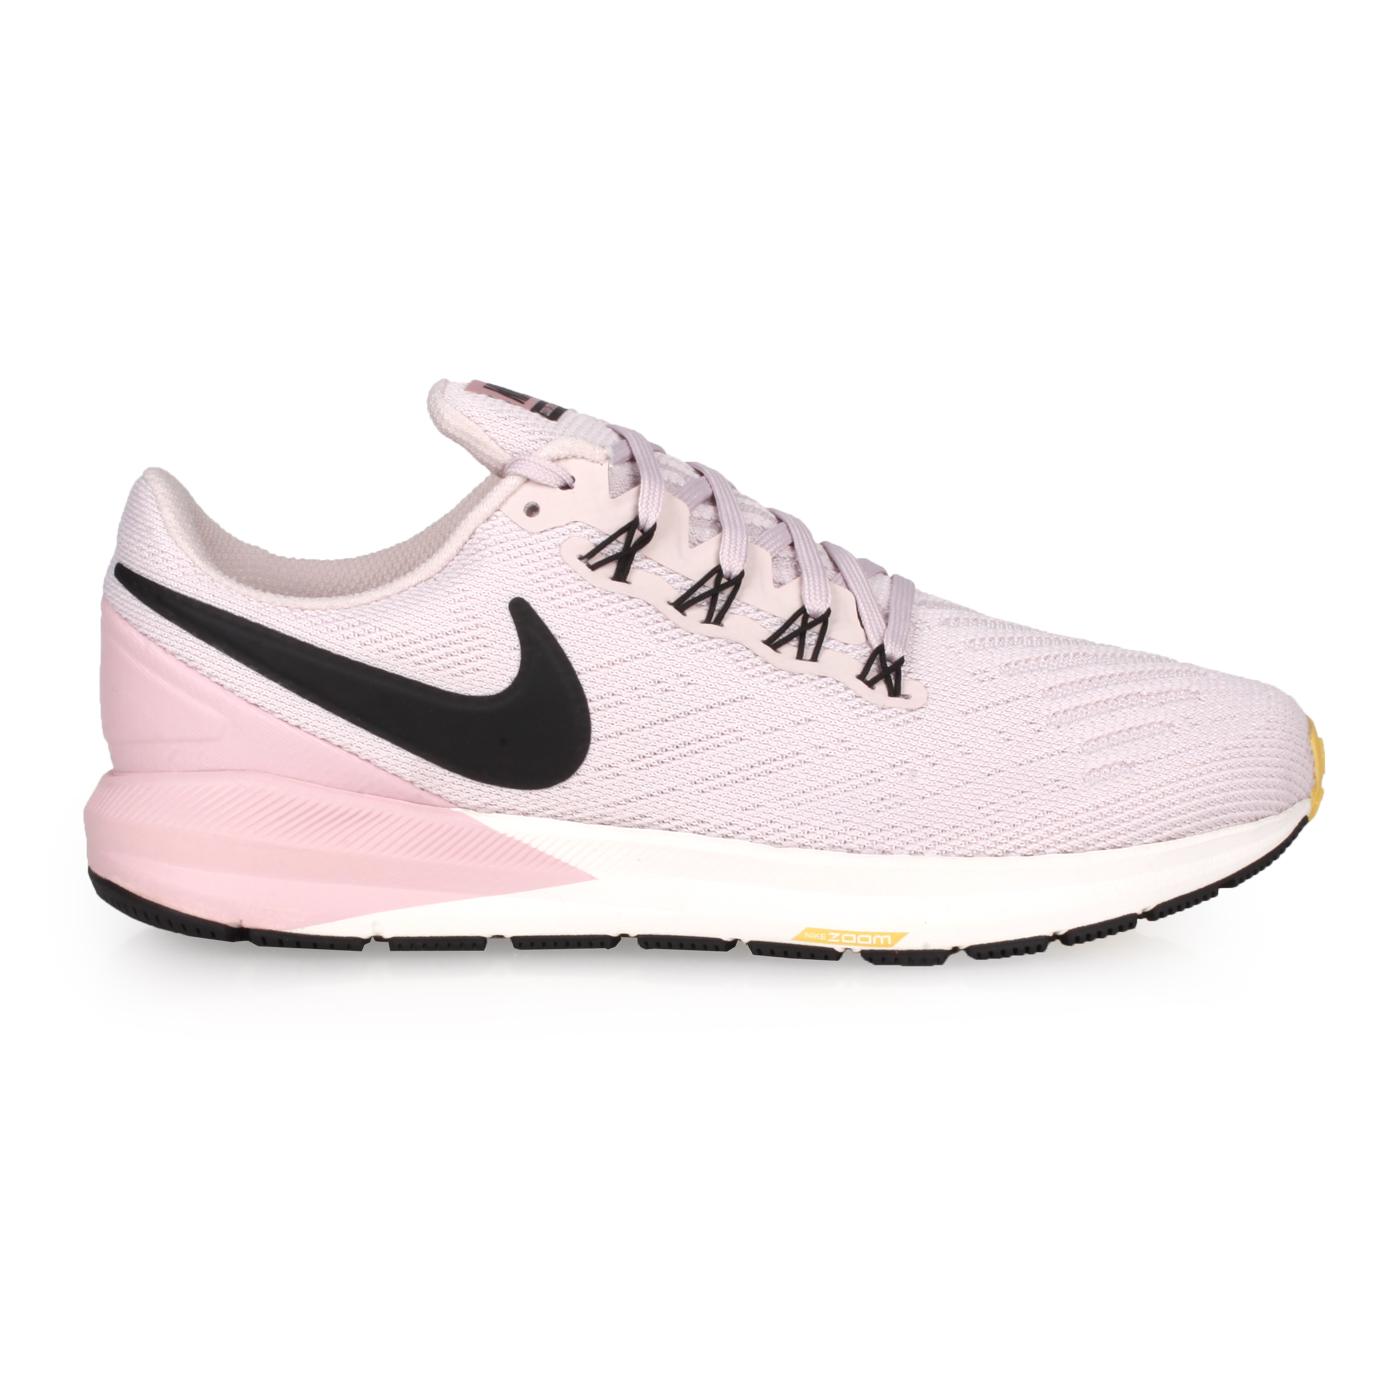 NIKE 女款慢跑鞋  @W AIR ZOOM STRUCTURE 22@AA1640009 - 粉藕黑